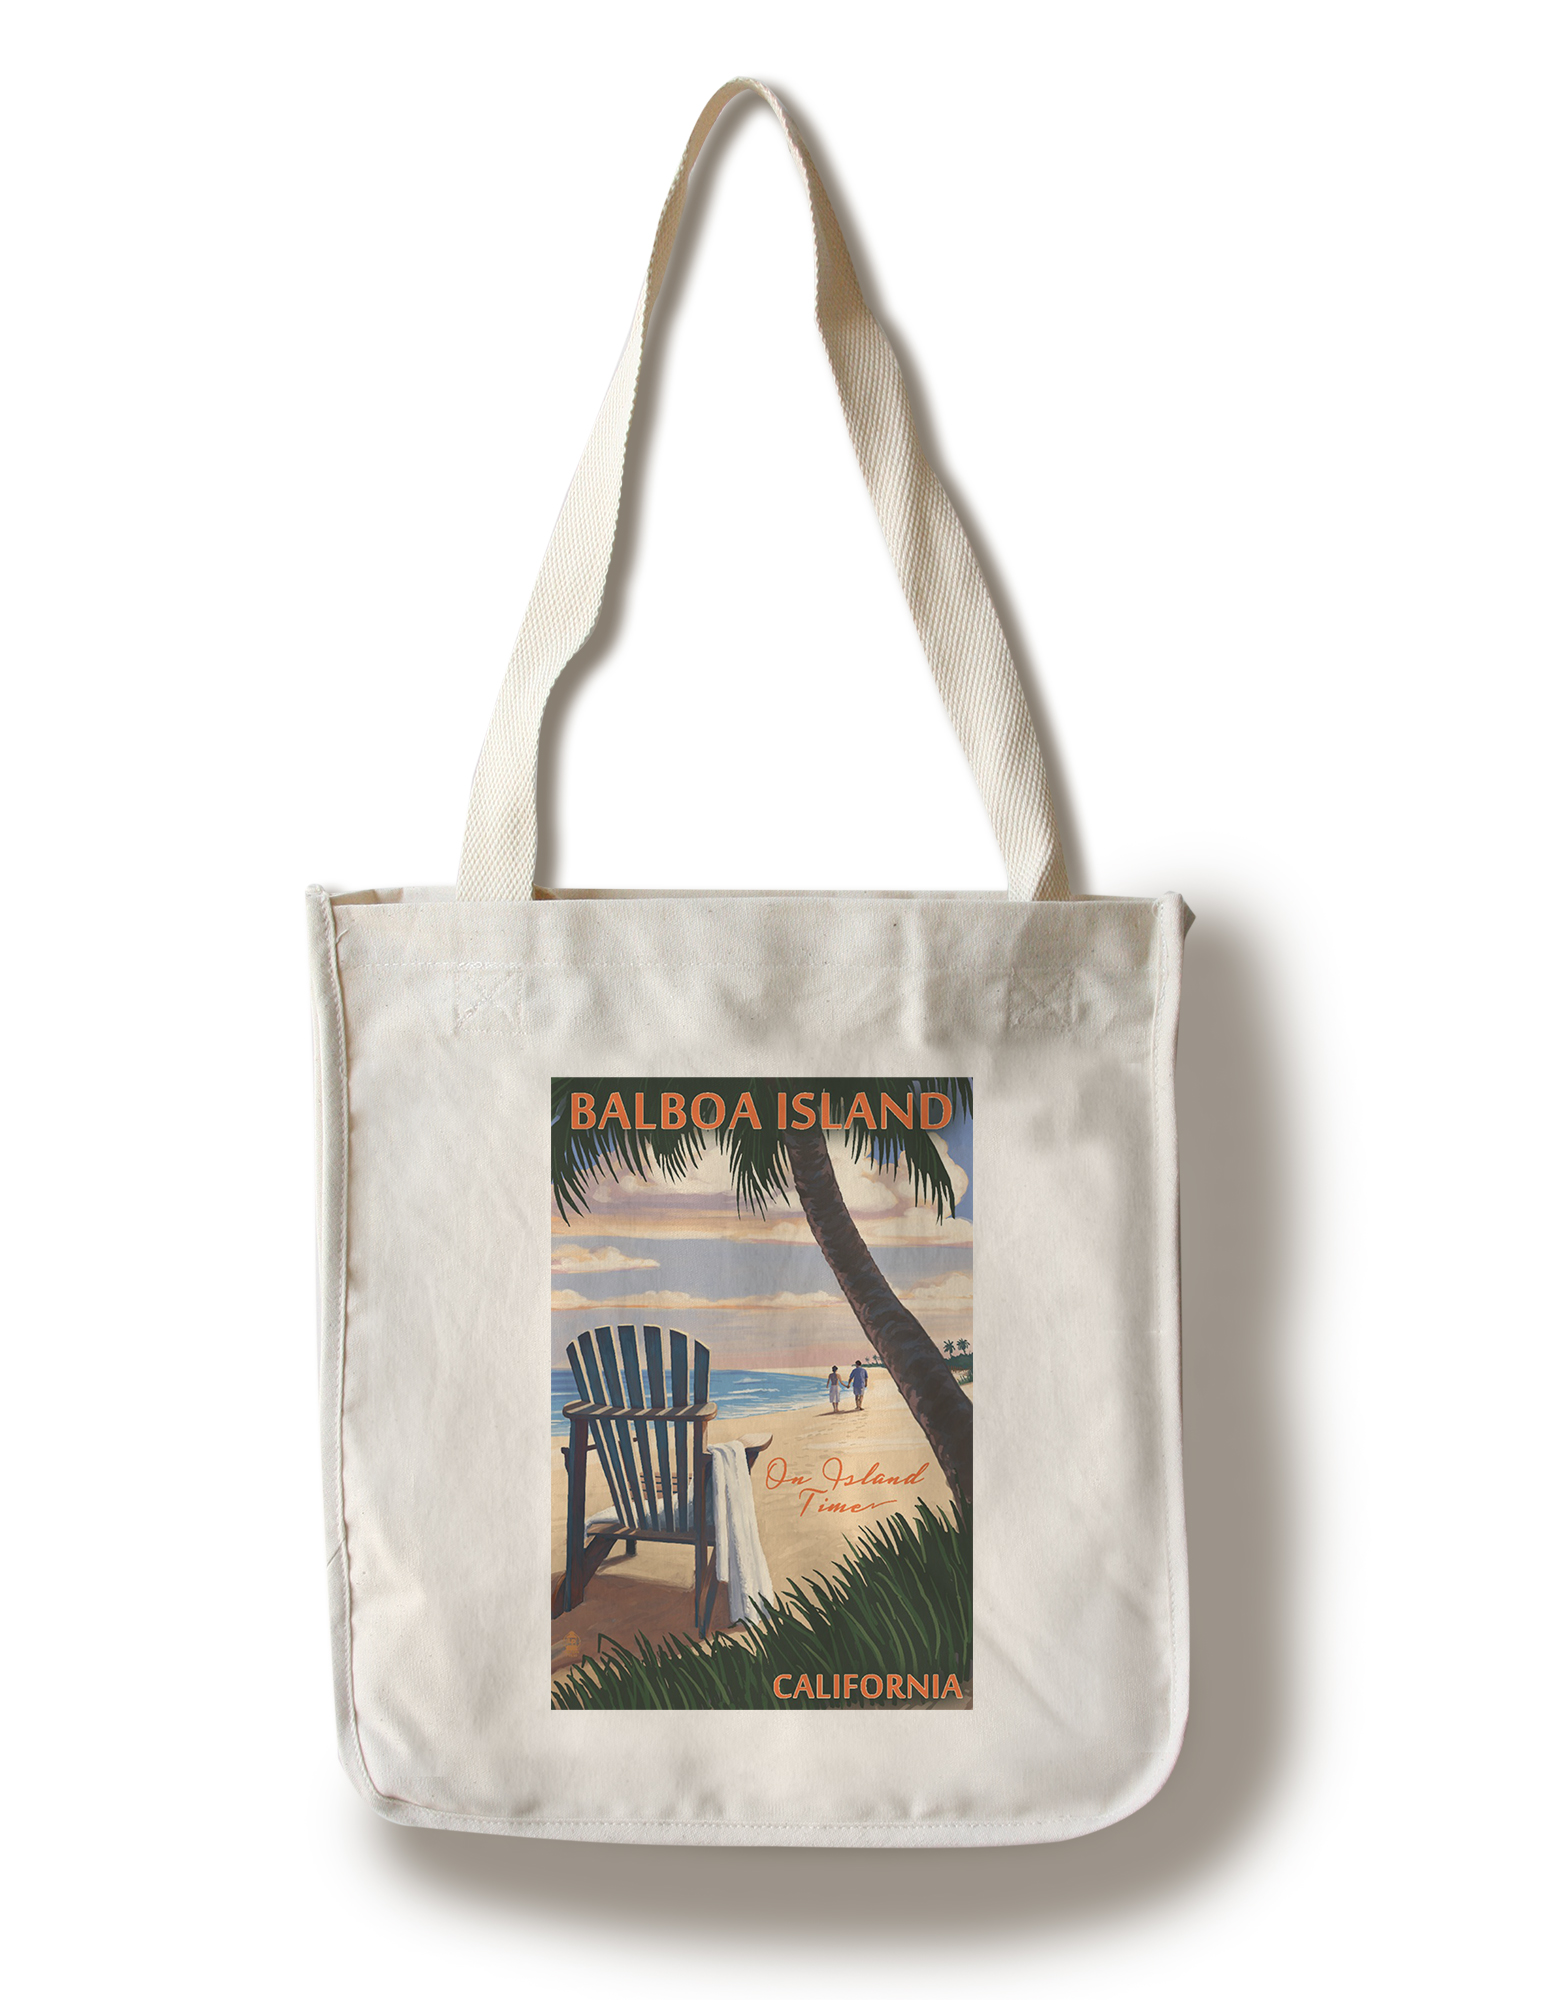 Balboa Island On Island Time Adirondack Chair on the Beach Lantern Press Artwork (100% Cotton Tote Bag Reusable) by Lantern Press